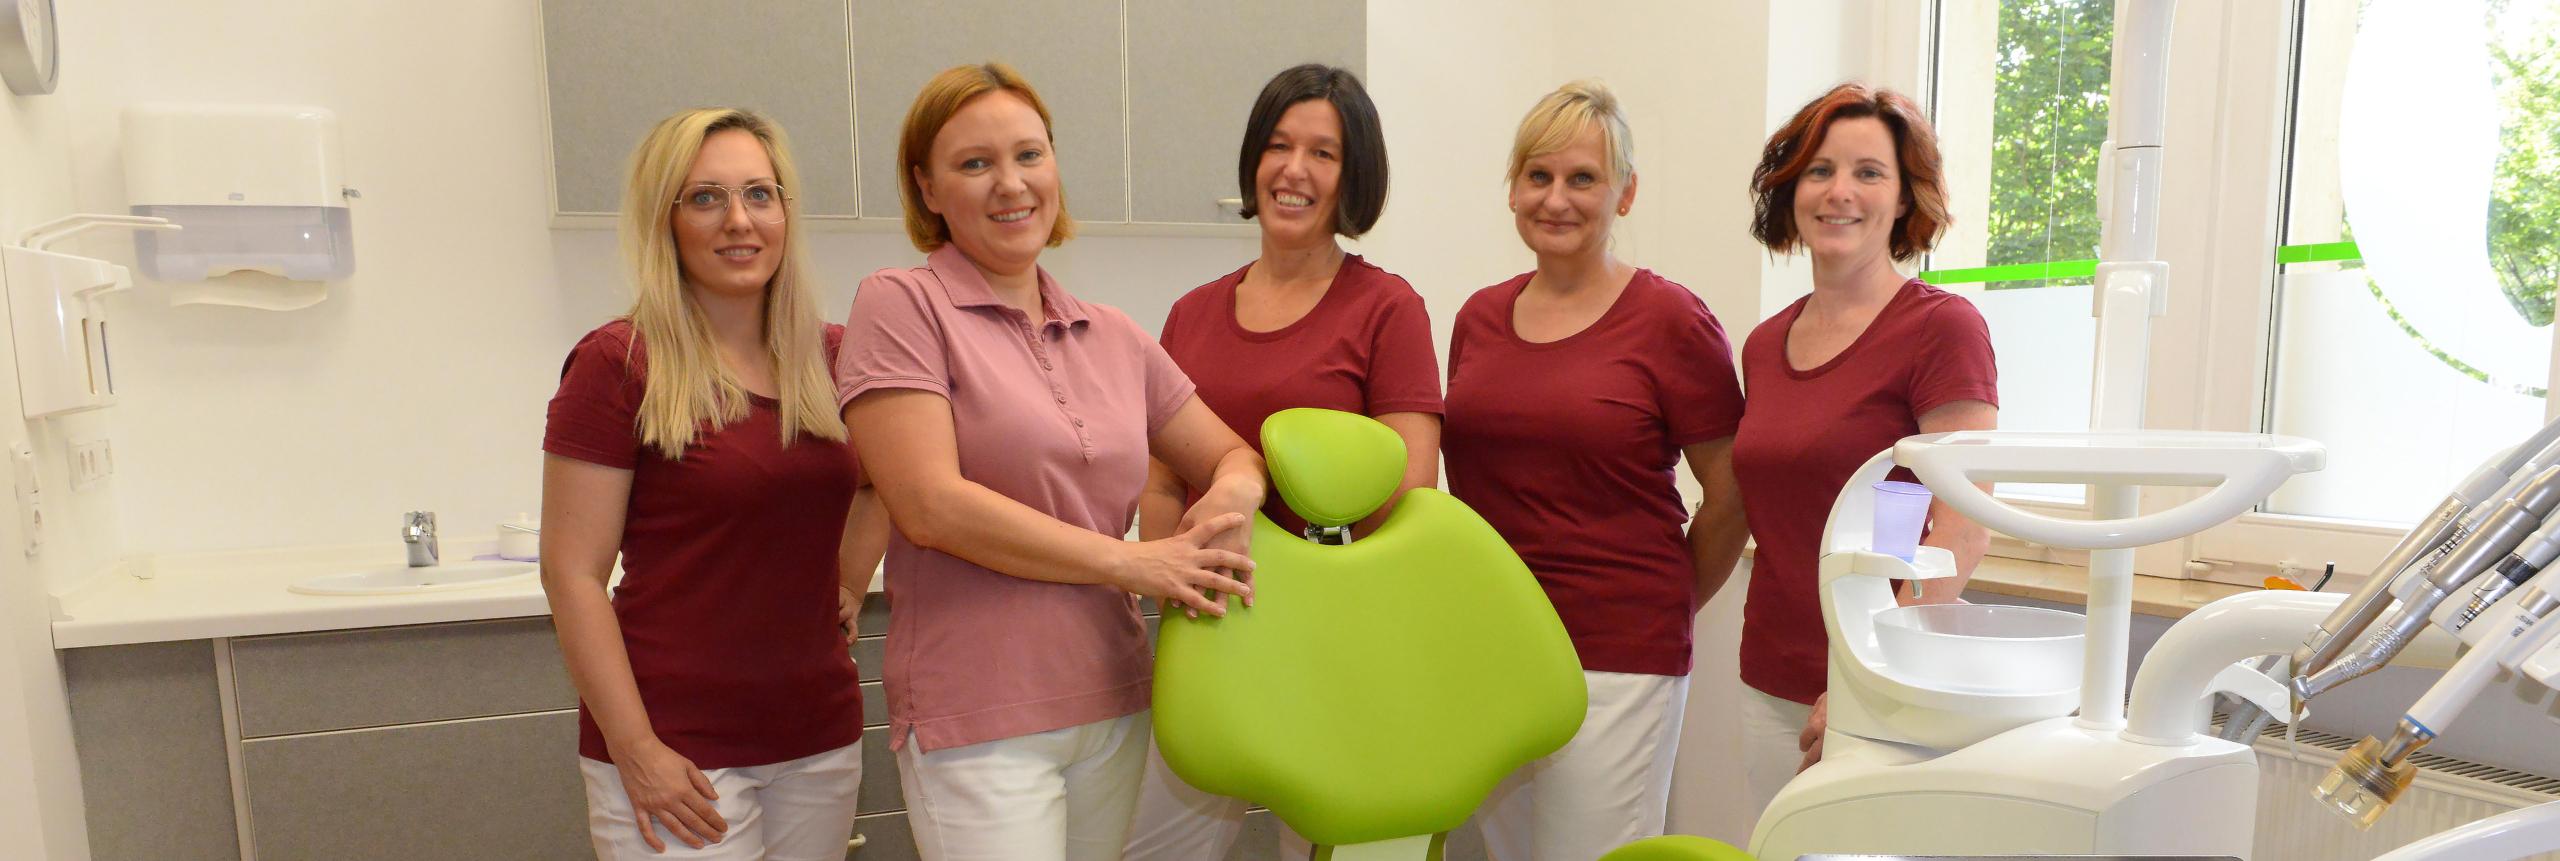 Praxis Pyzara - Ihre Zahnarztpraxis in Dresden Südvorstadt